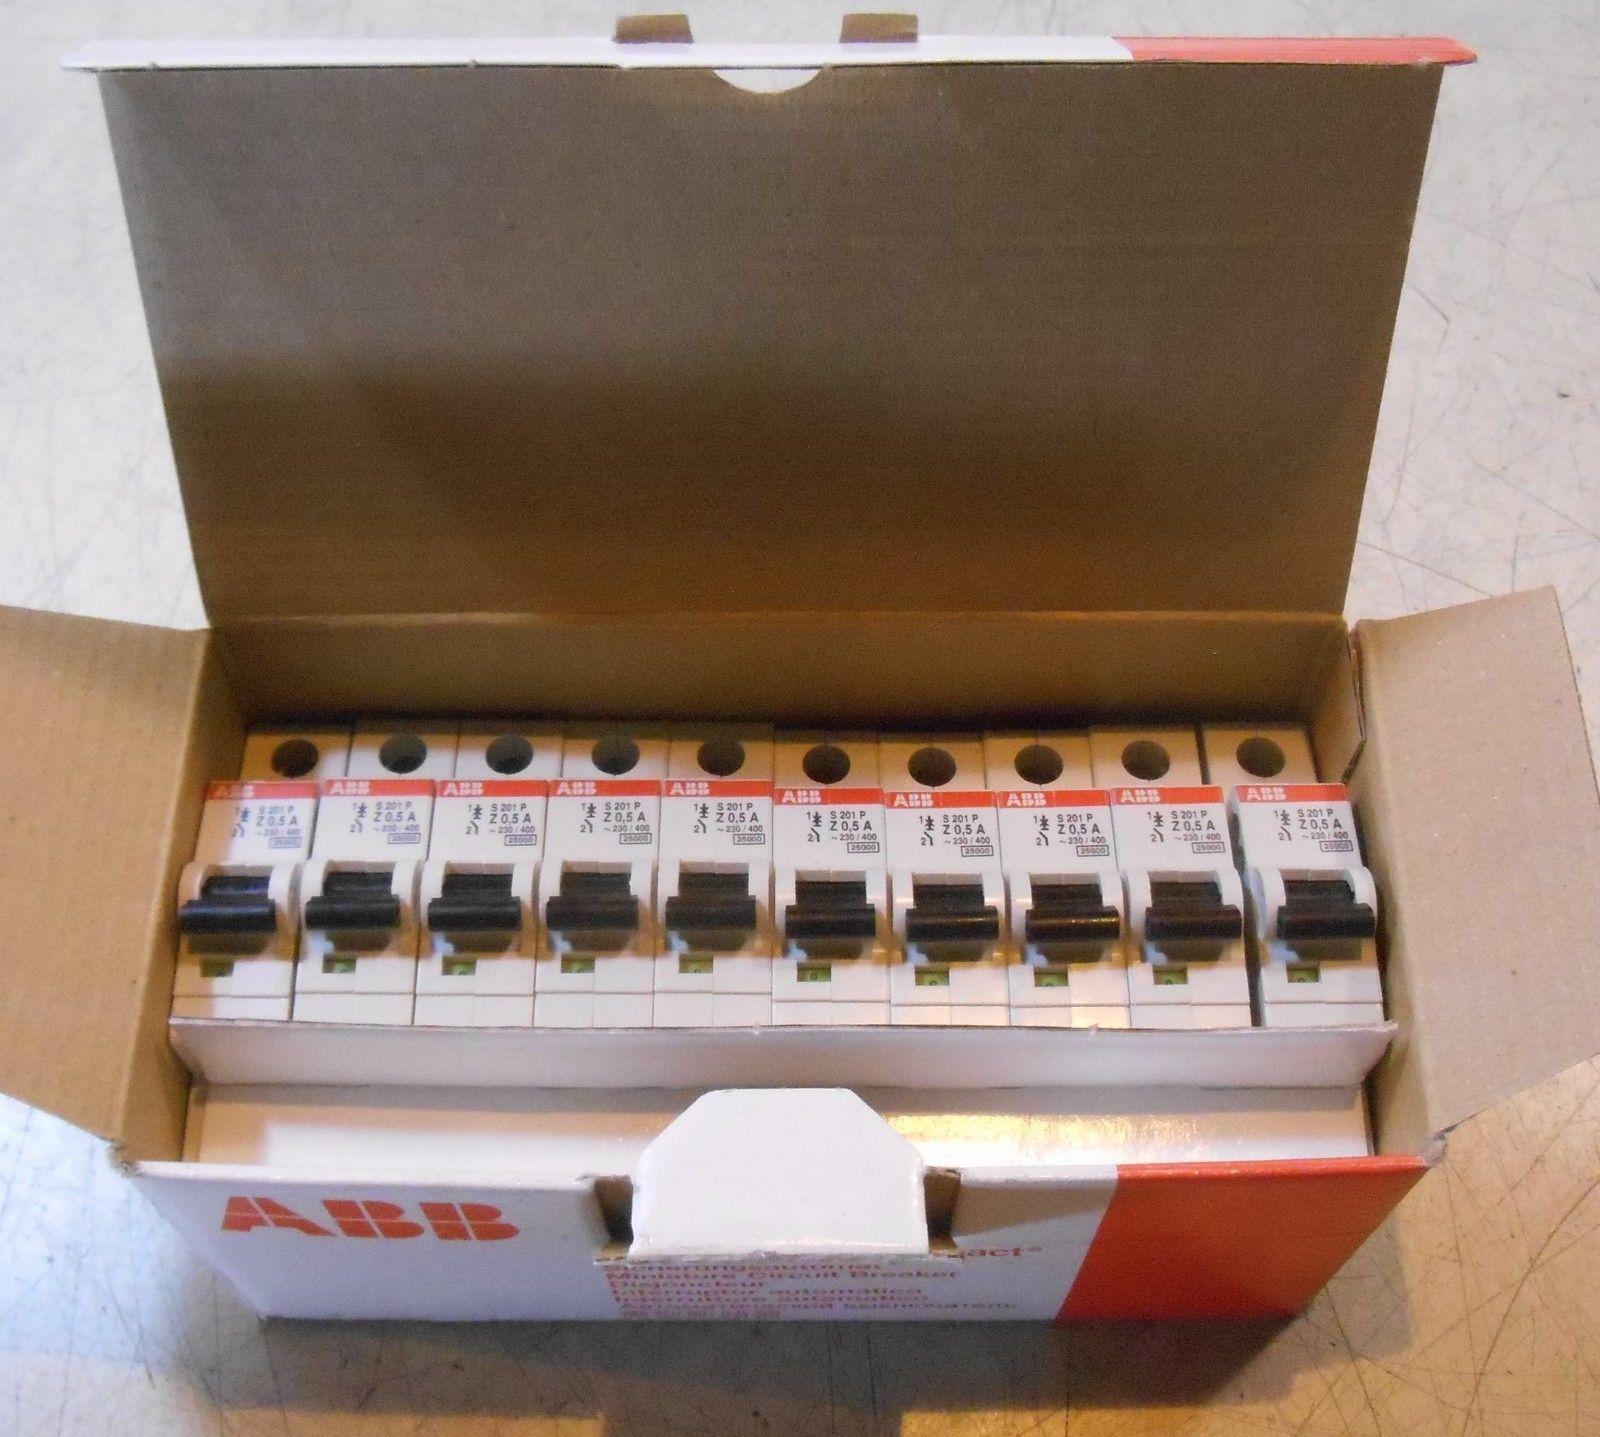 New Box Of 10 Abb Circuit Breakers S 201p 2cd S281 001 R0158 Breaker Labels Ebay Link